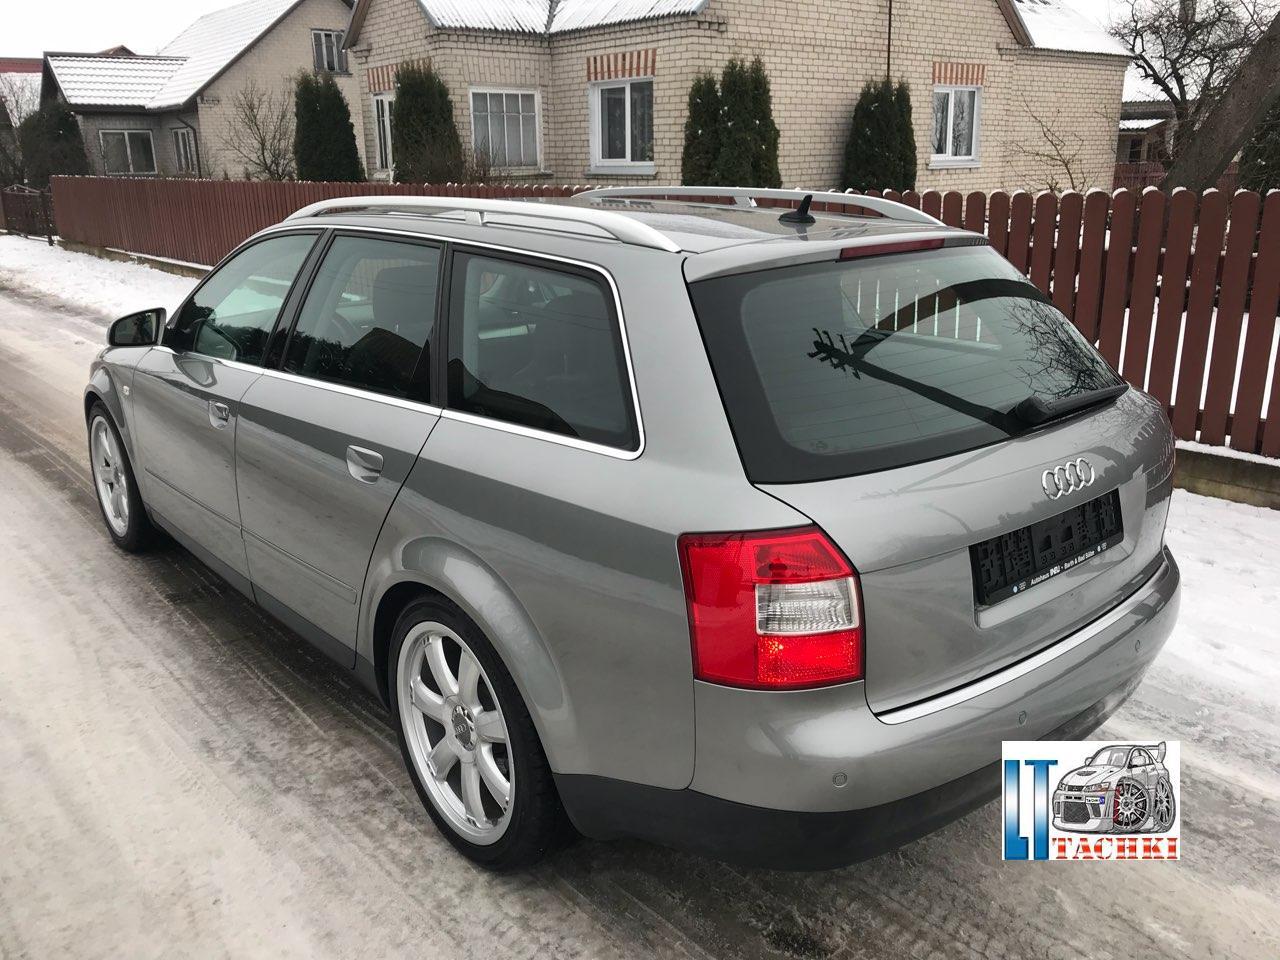 Audi A4 2.5 V6 TDI Quattro